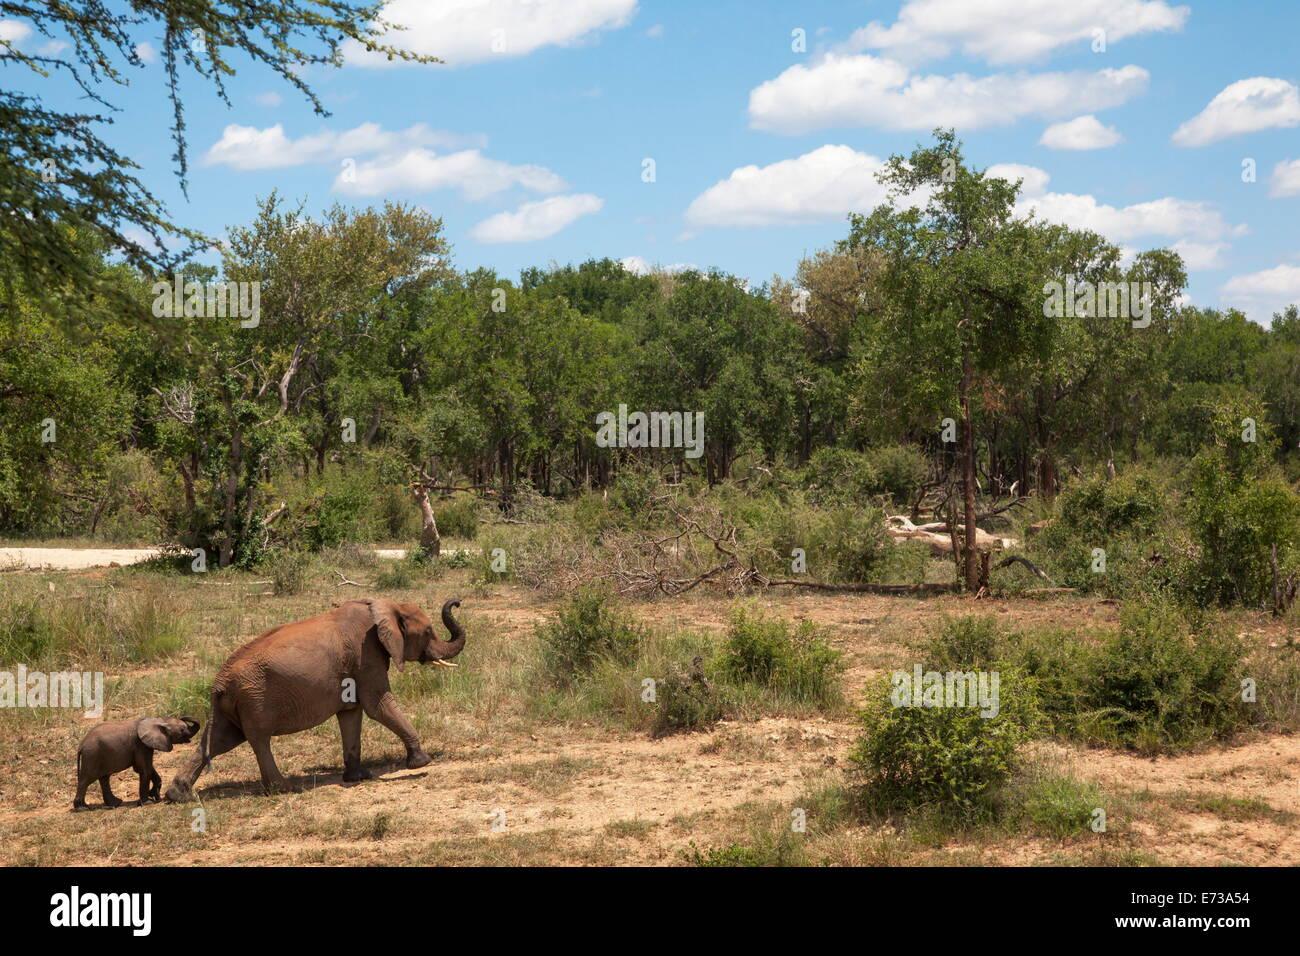 El elefante africano (Loxodonta africana) de salir del agua, reserva Madikwe, North West Province, Sudáfrica, Imagen De Stock